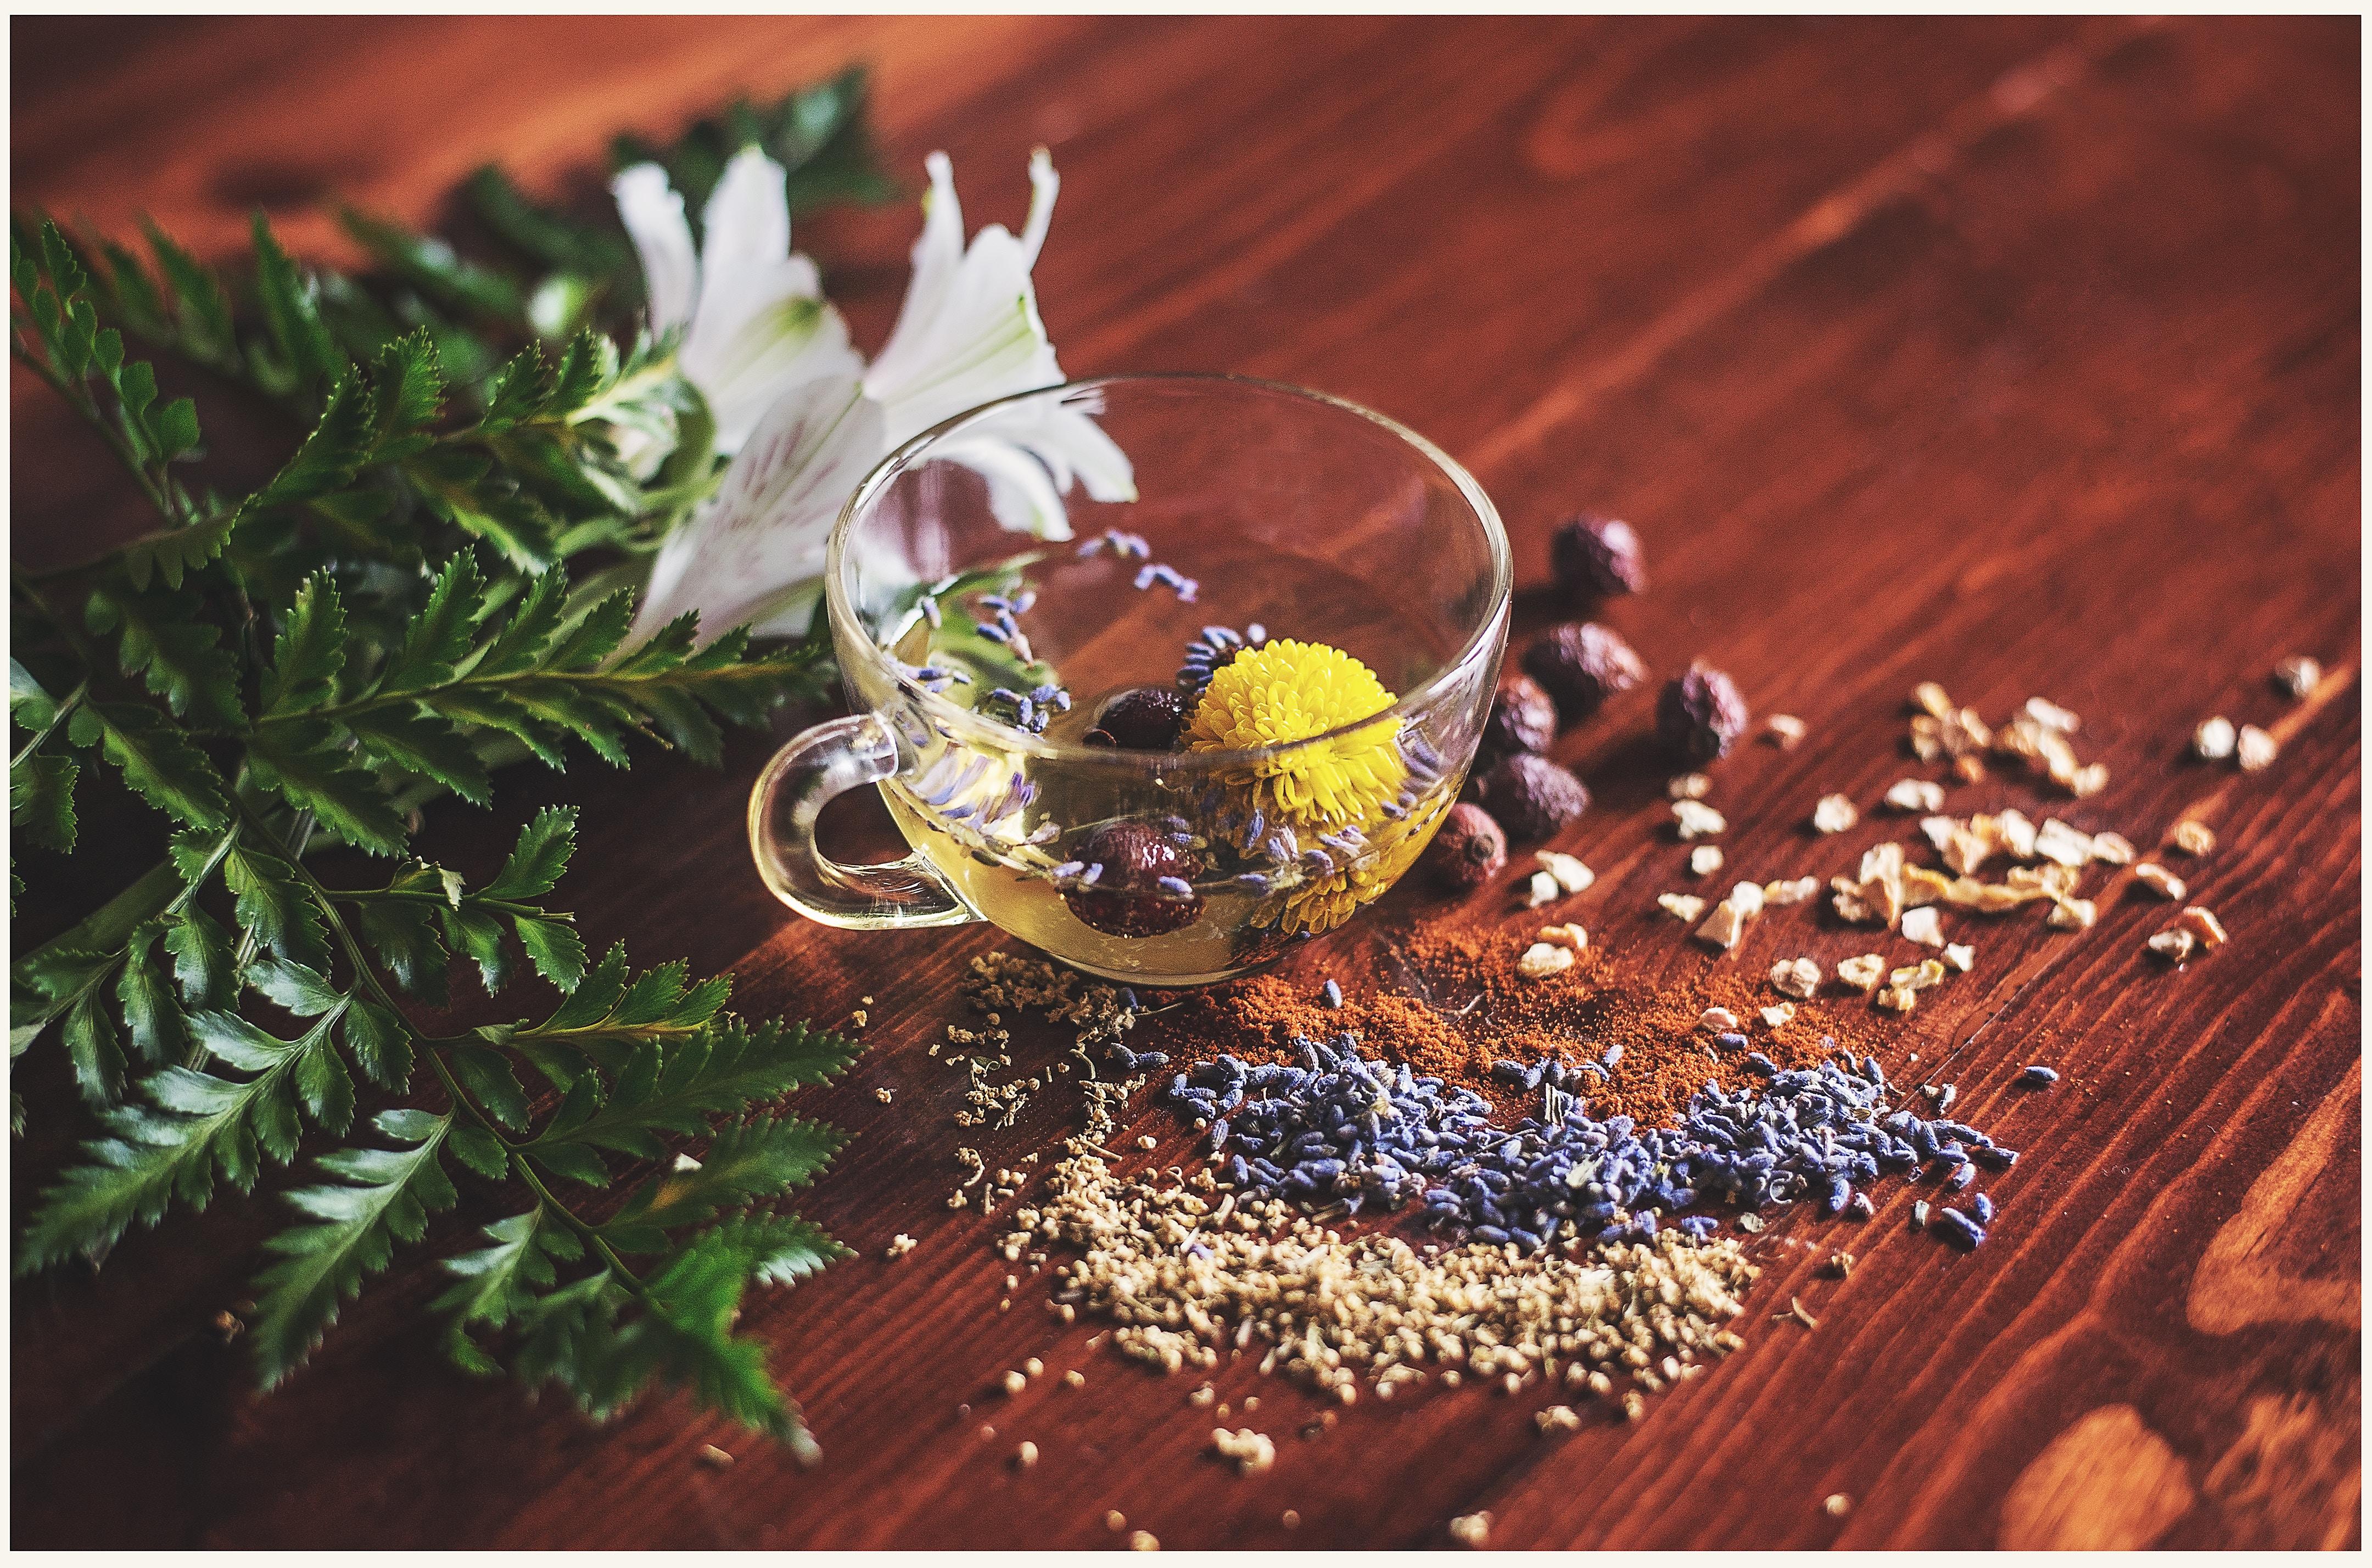 Tea Flower and Seeds